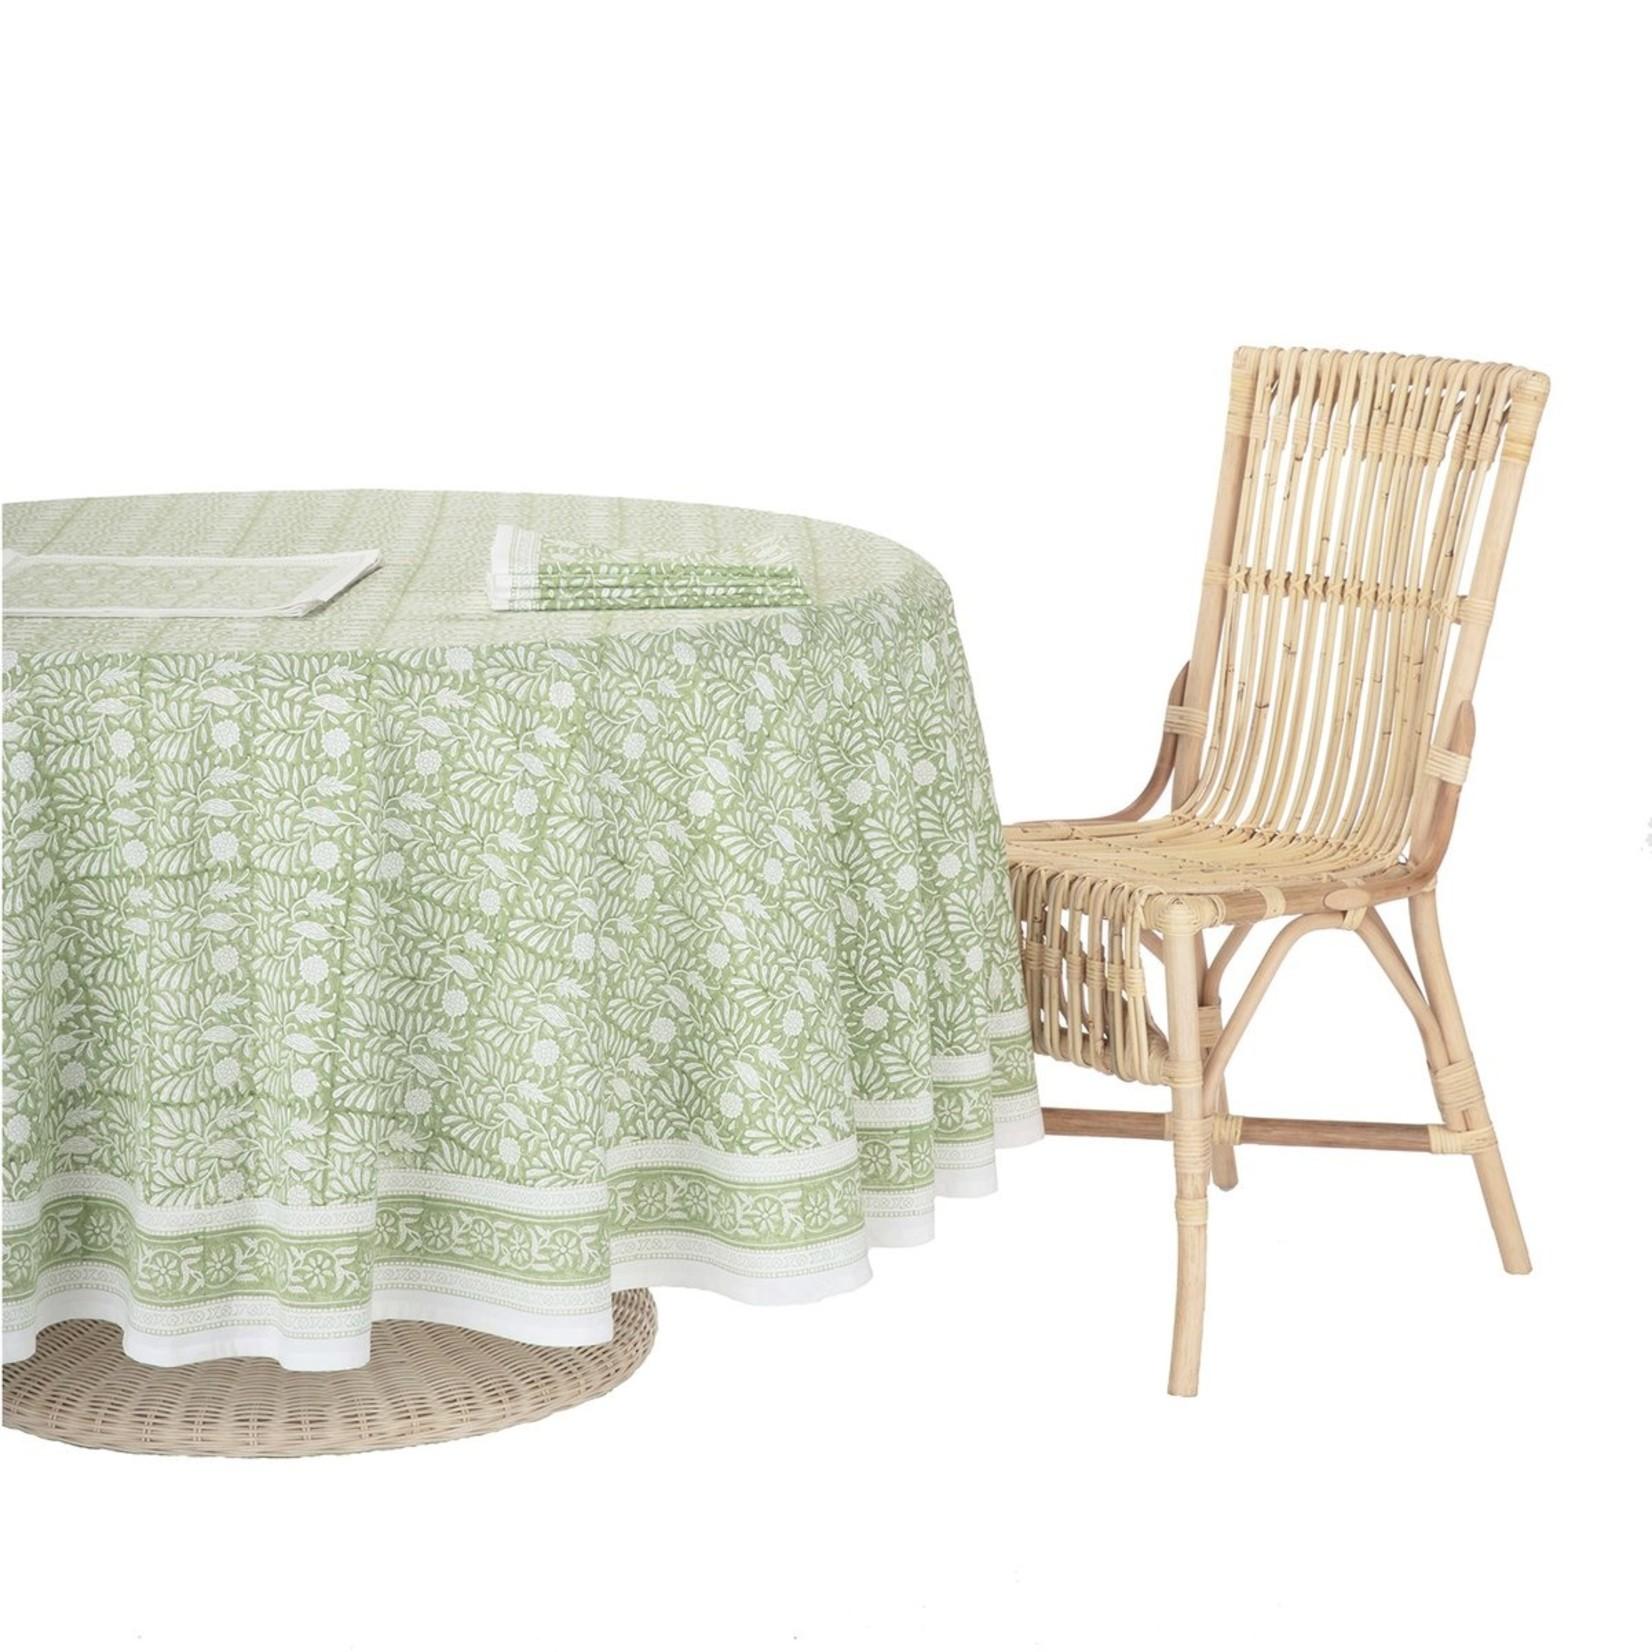 Amanda Lindroth Hand-Blocked Jasmine Tablecloth